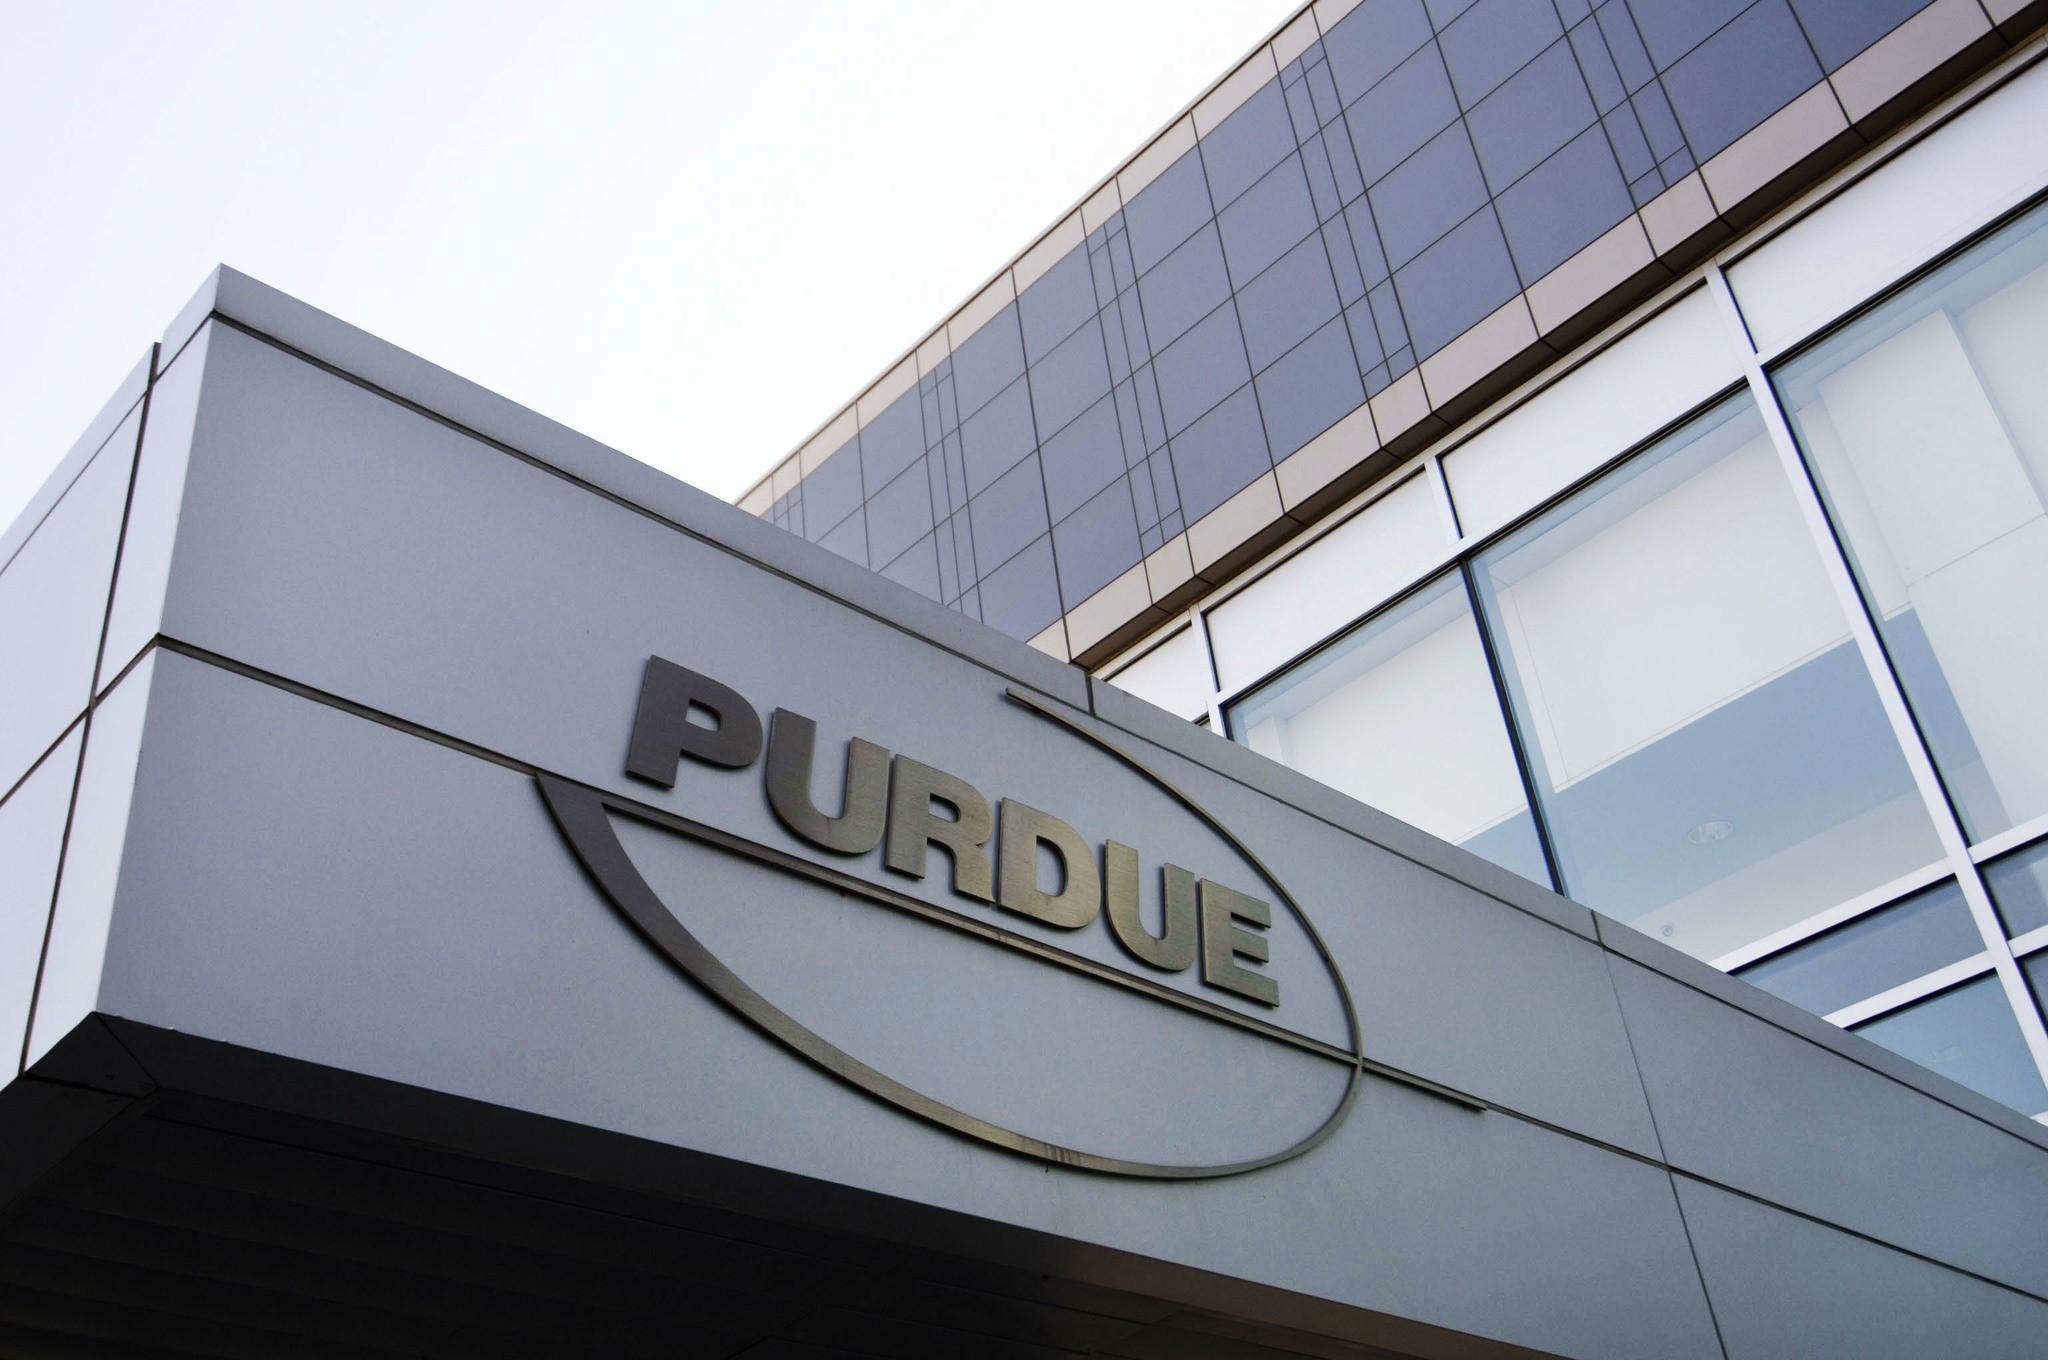 Purdue Pharmau2019s offices in Stamford, Conn.